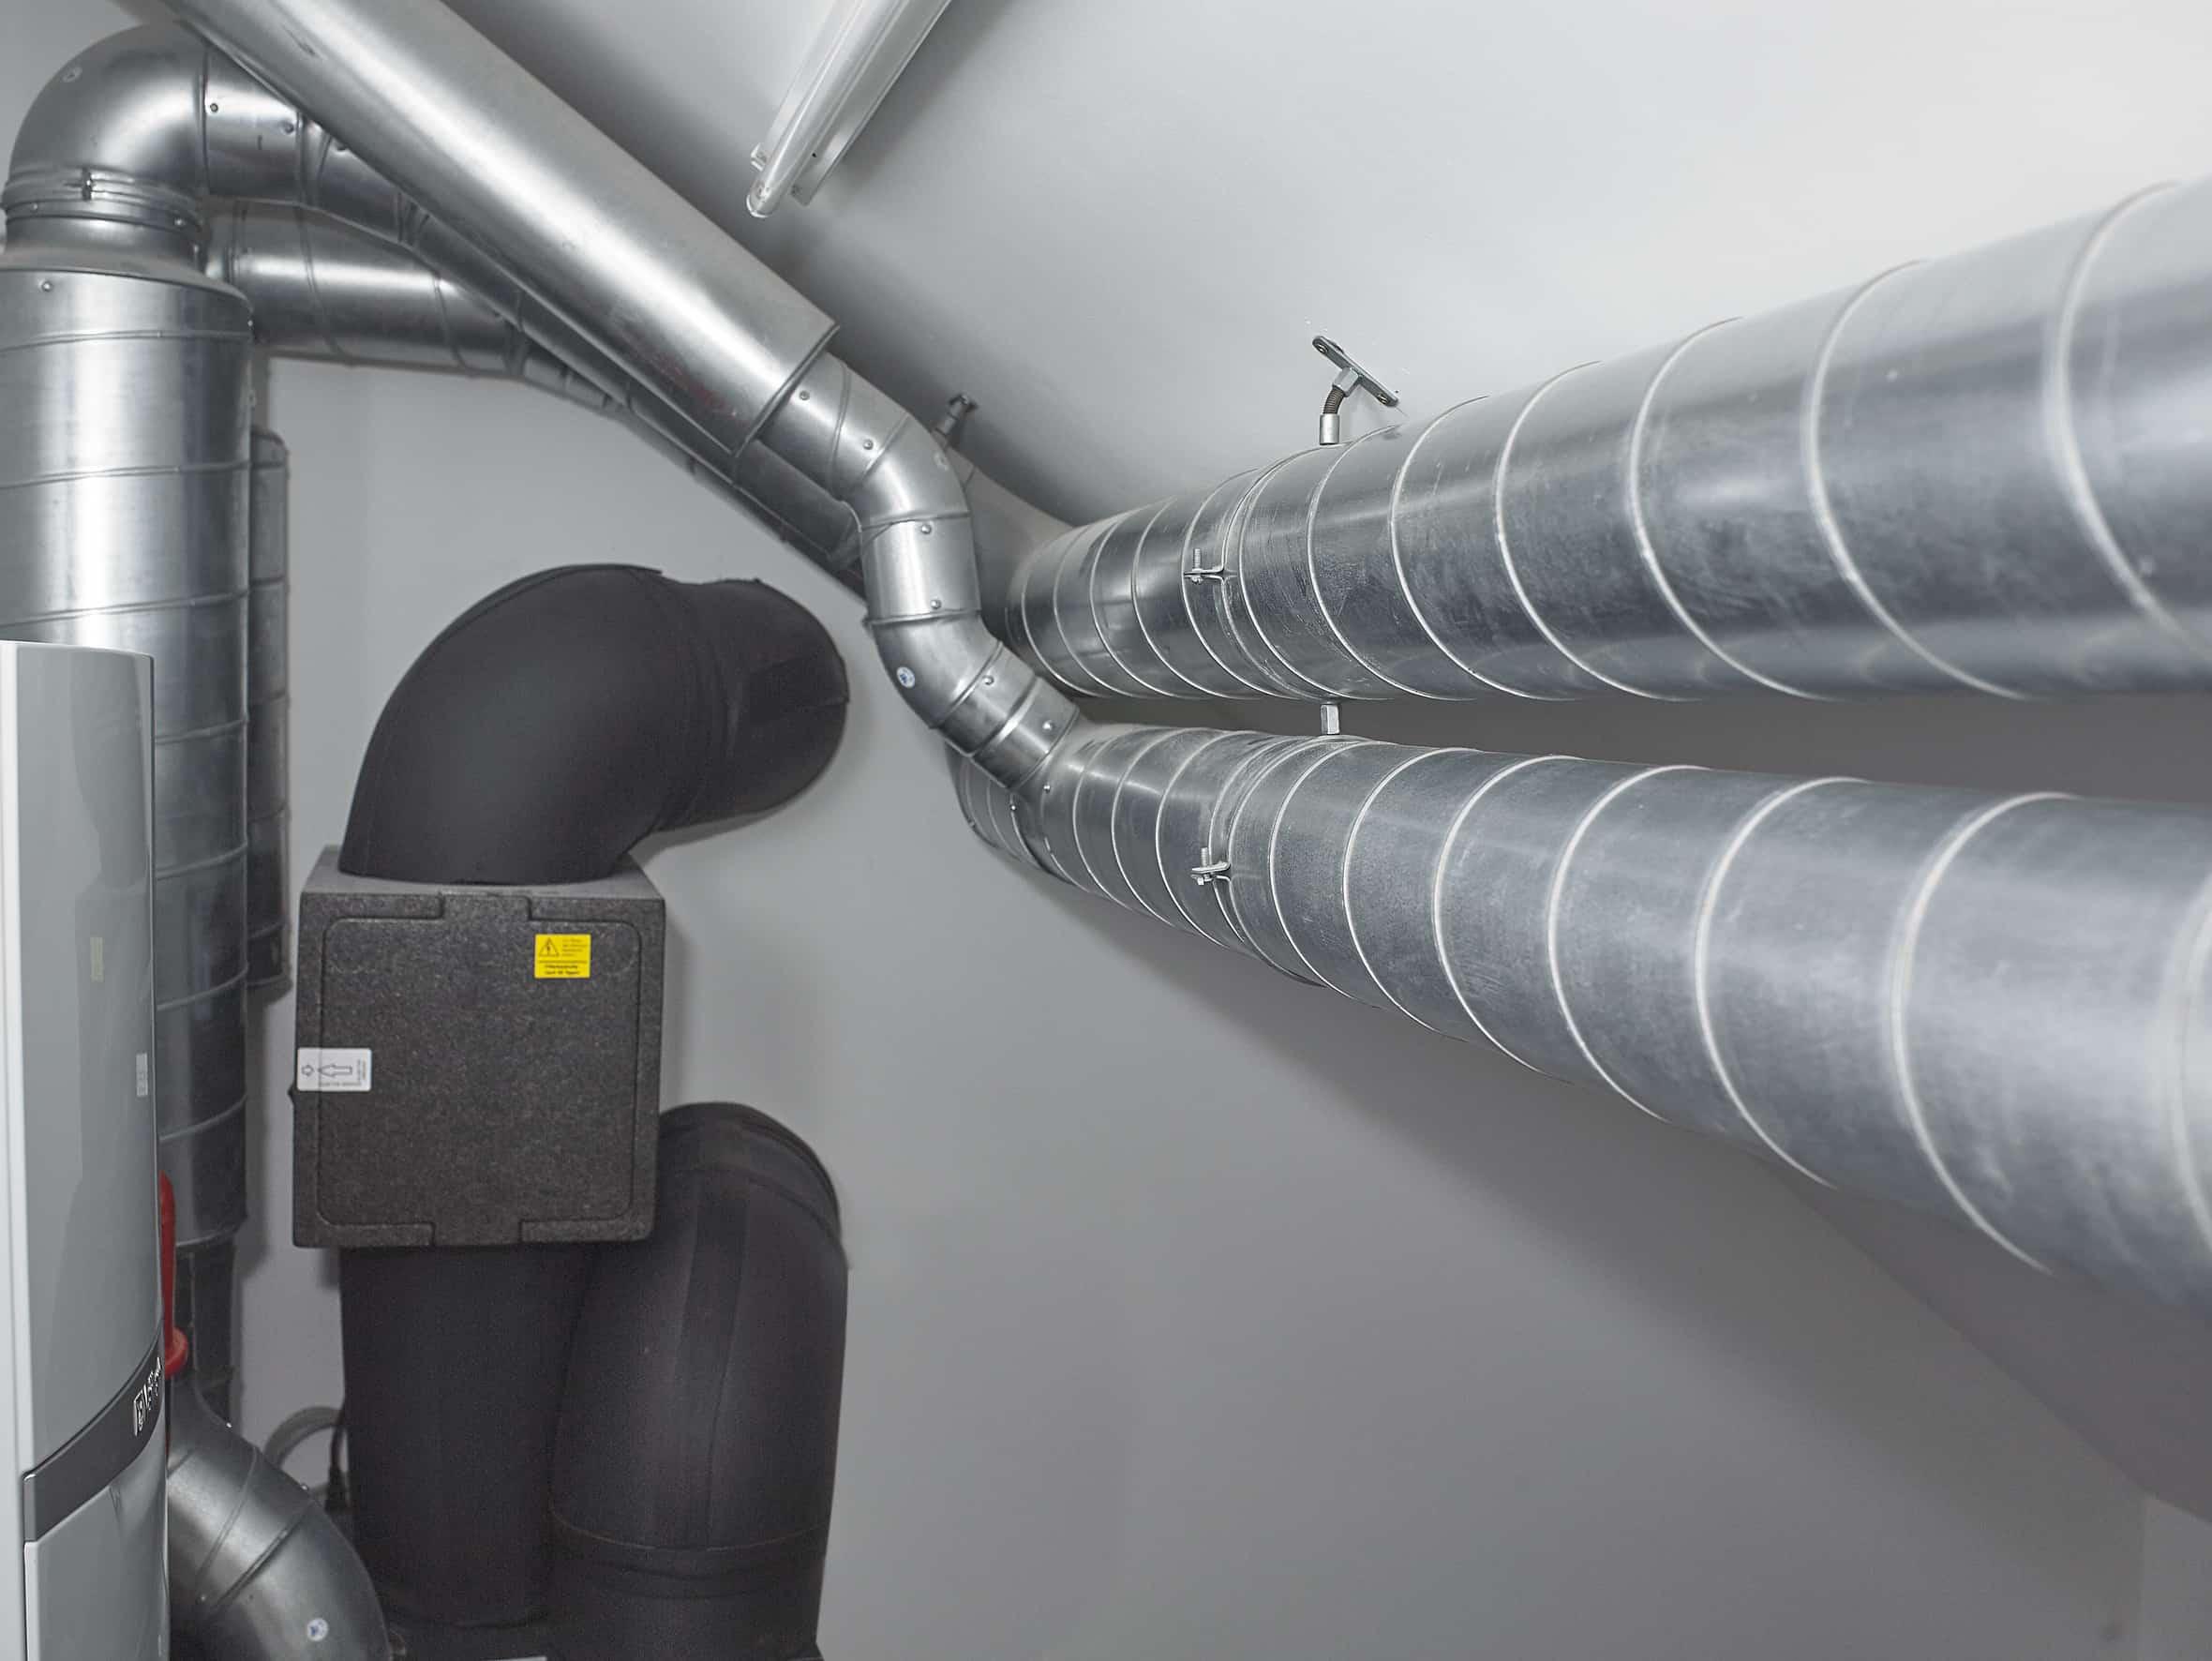 Golcar Passivhaus Mvhr Amp Heating Strategies Green